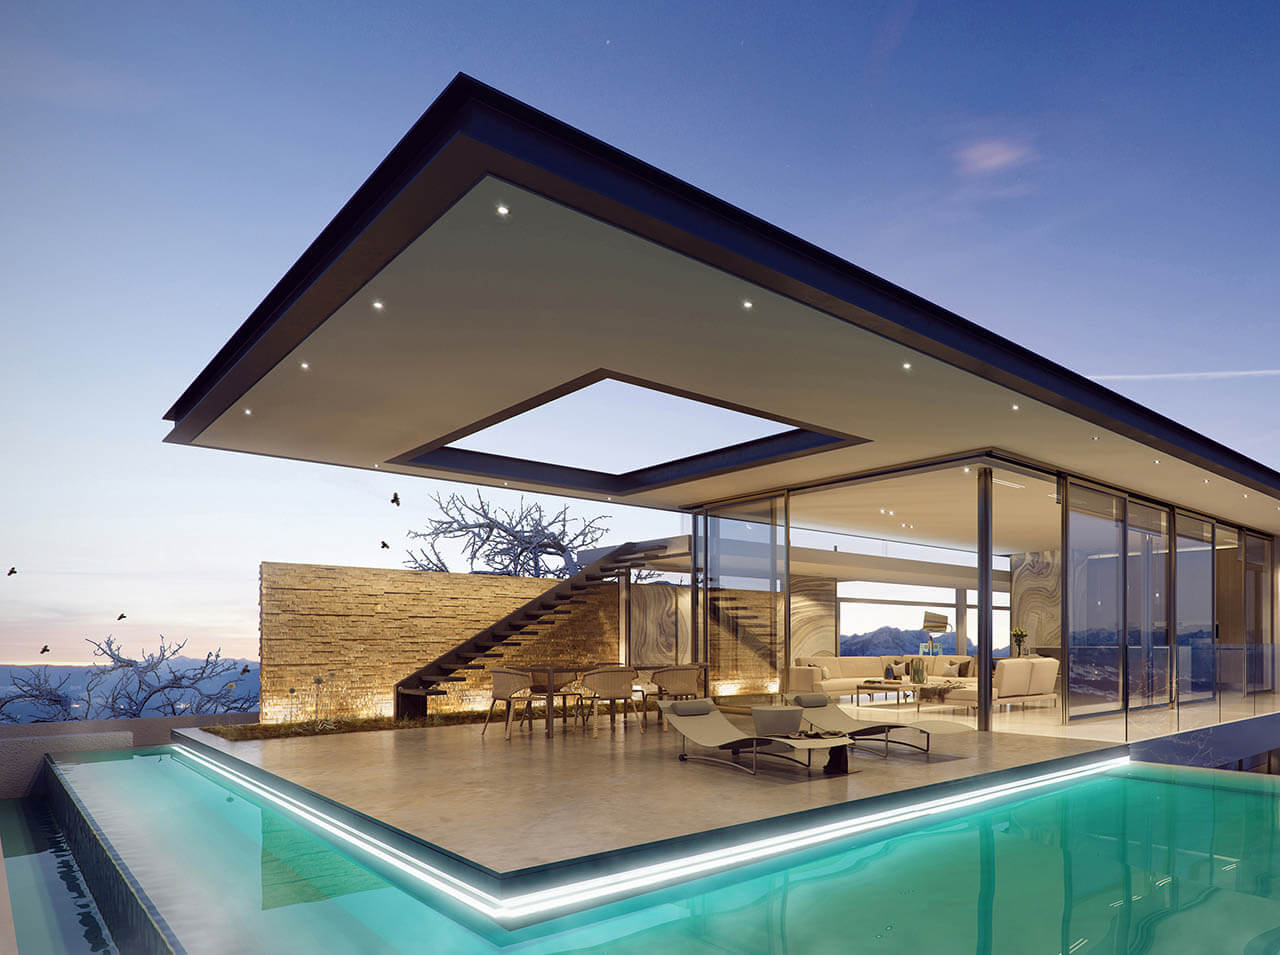 3D Render Futuristic Pool House